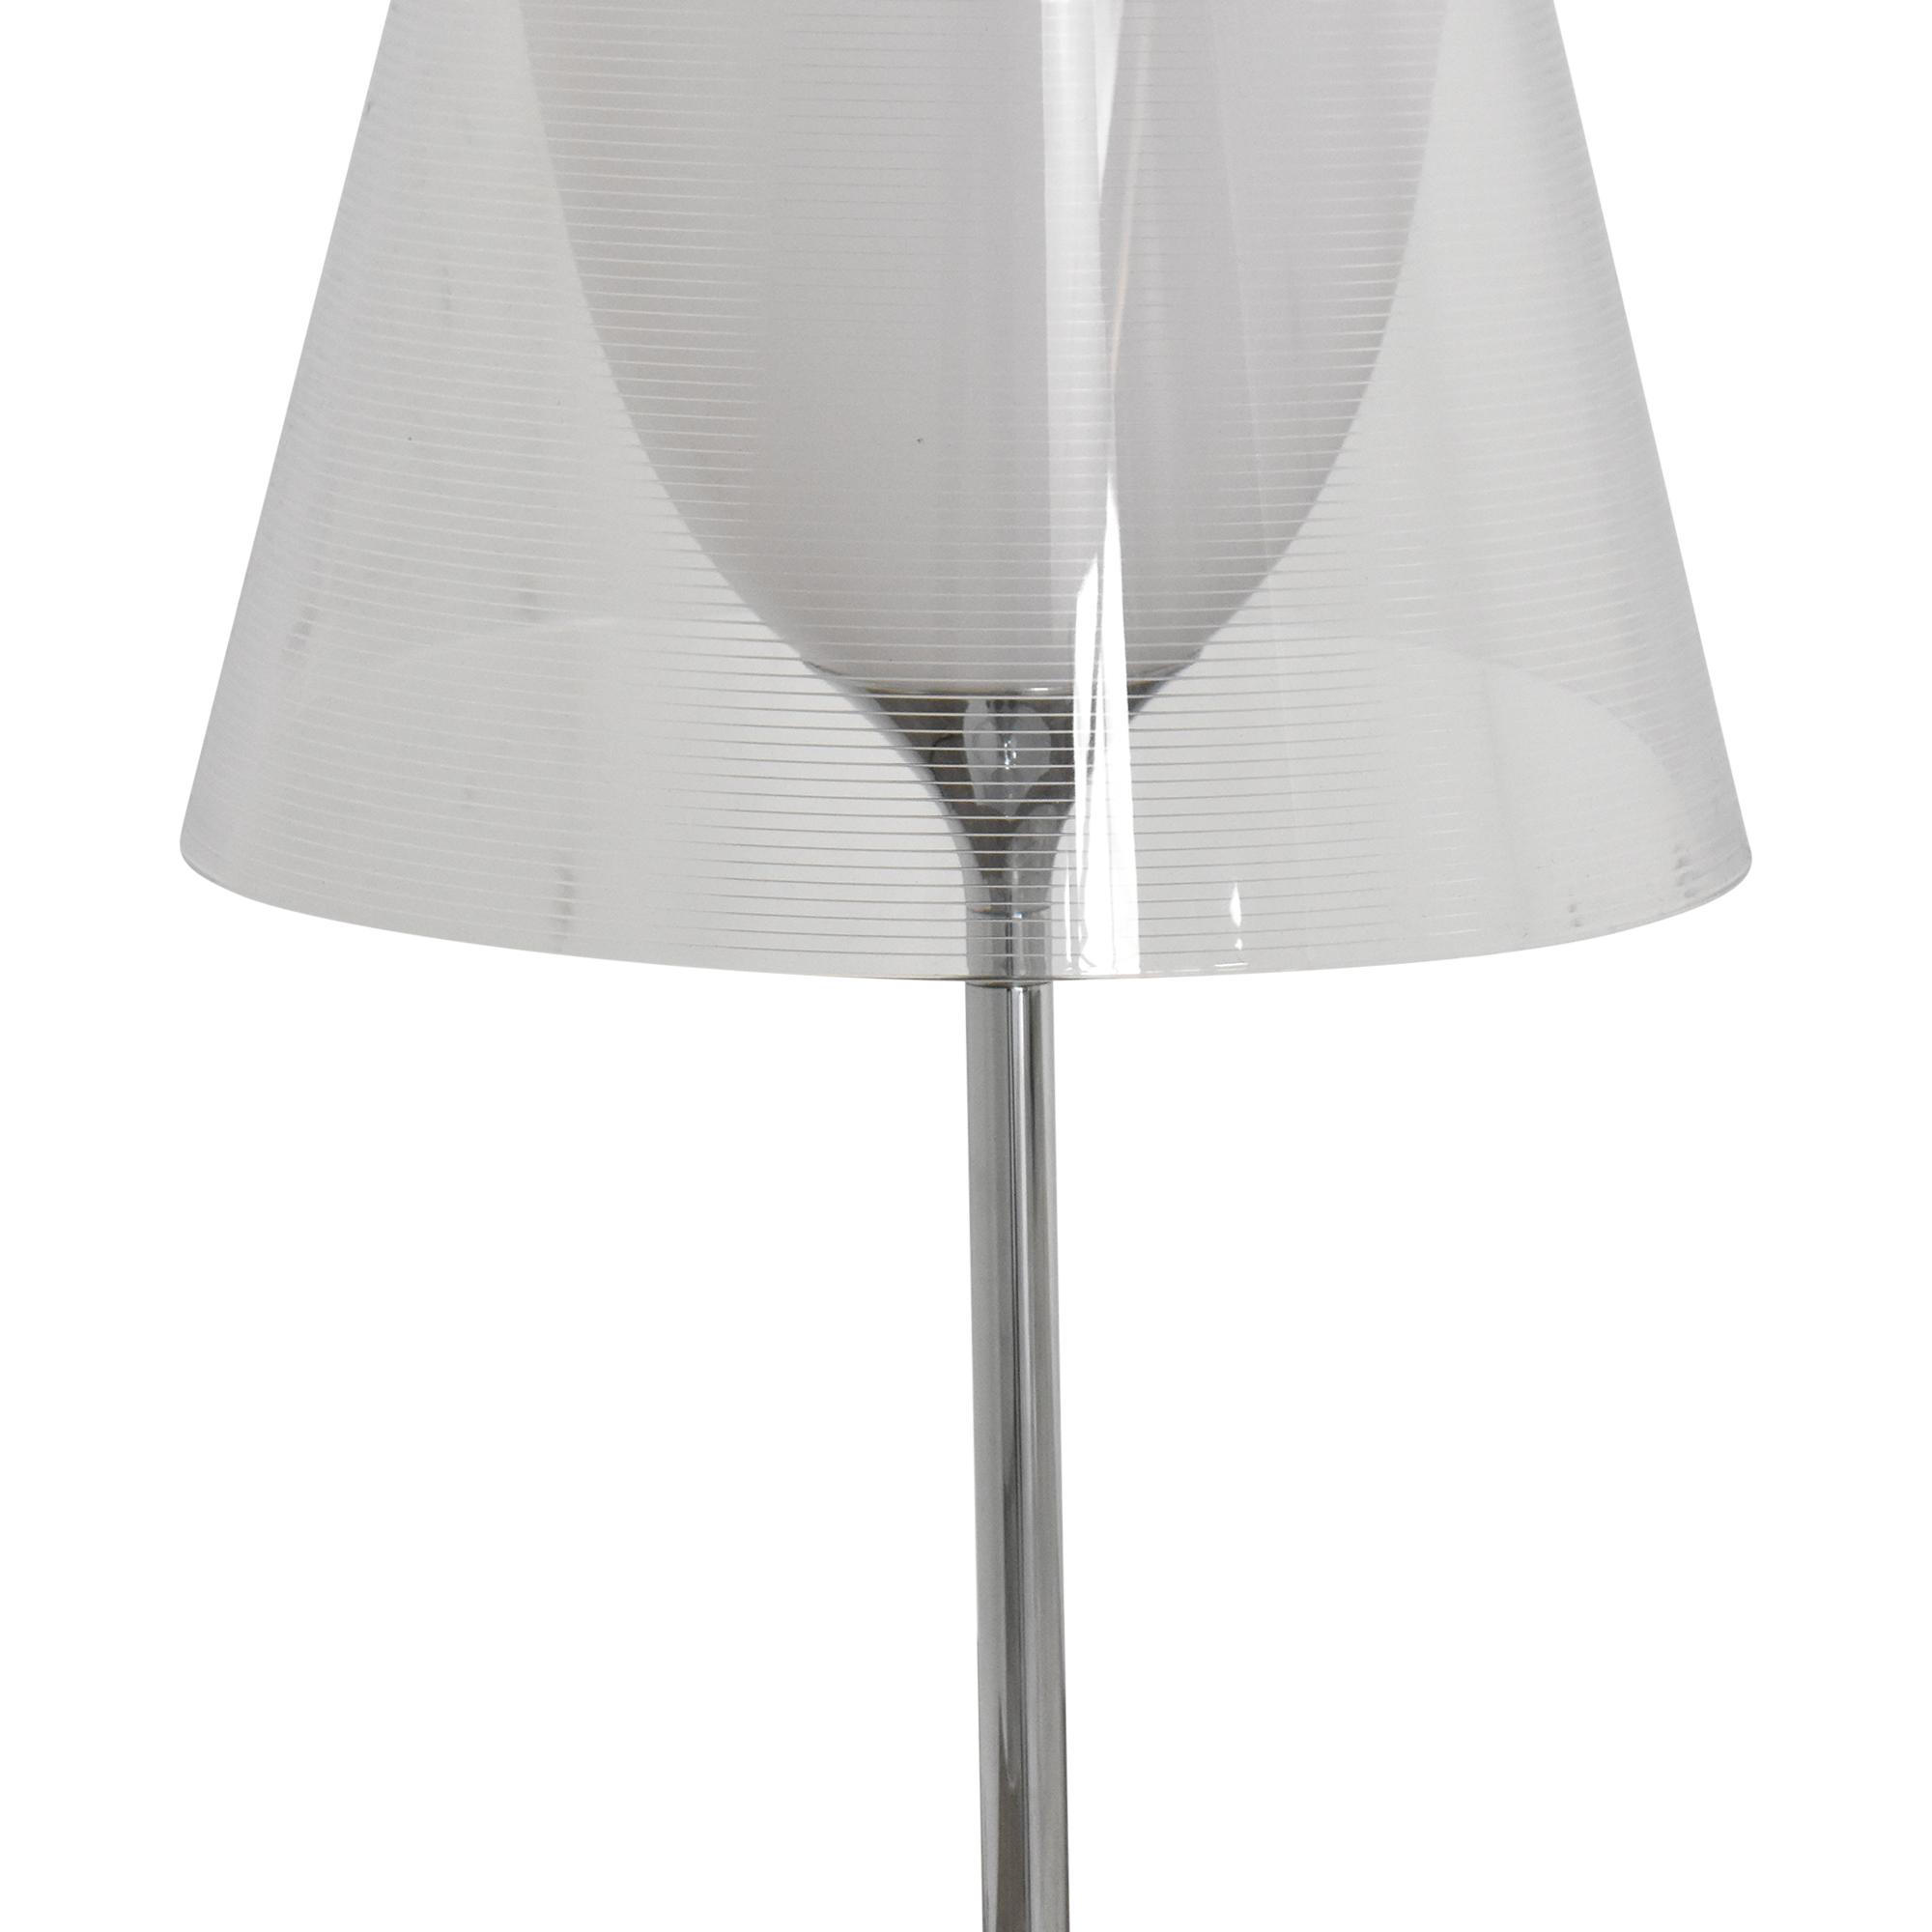 FLOS FLOS K Tribe T1 Table Lamp Decor